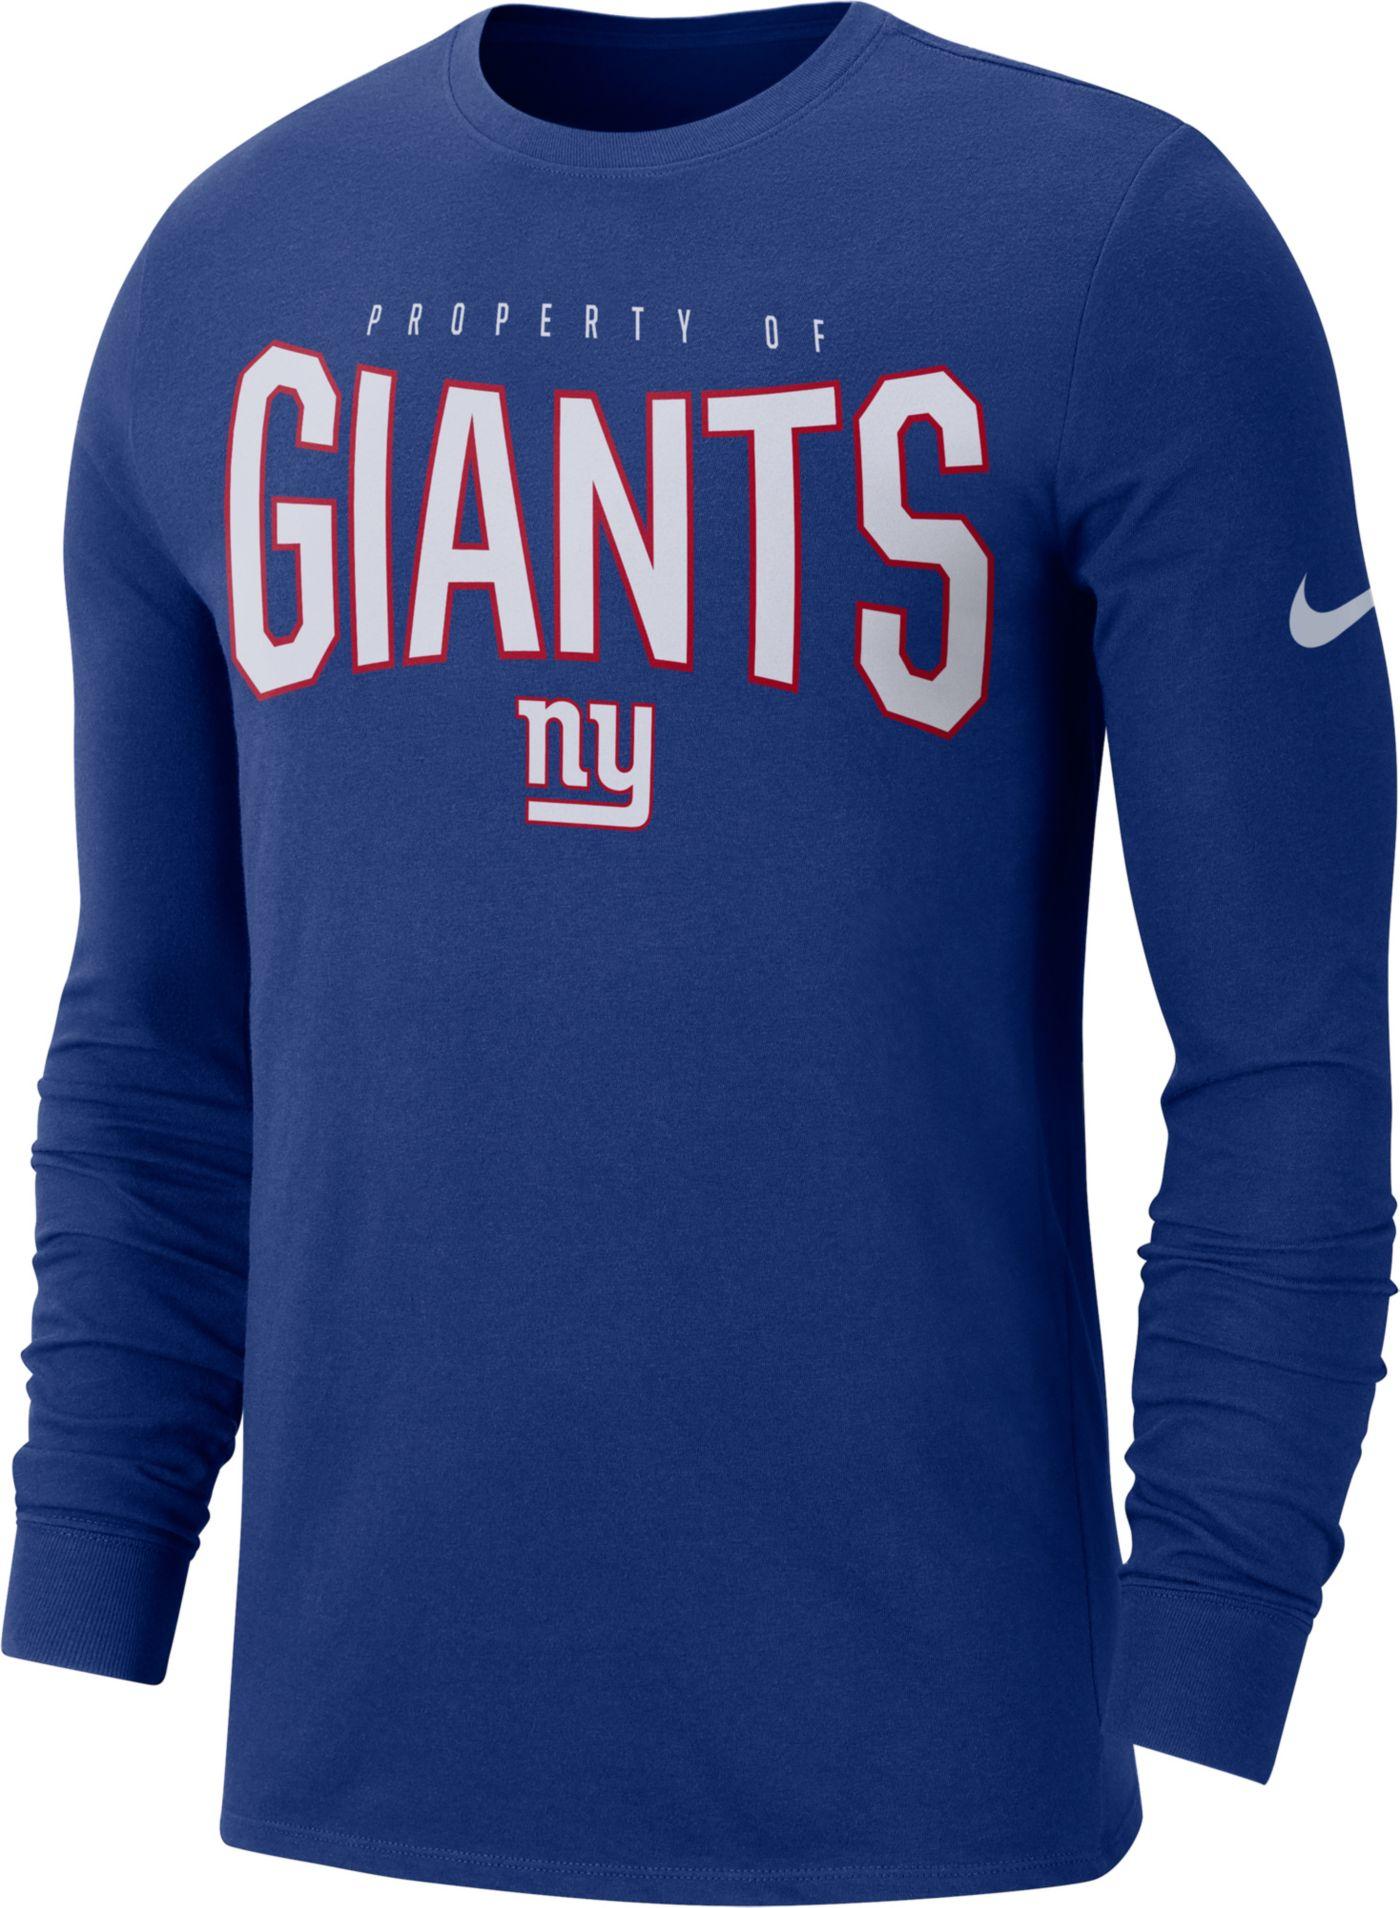 Nike Men's New York Giants Sideline Property Of Long Sleeve Blue Shirt